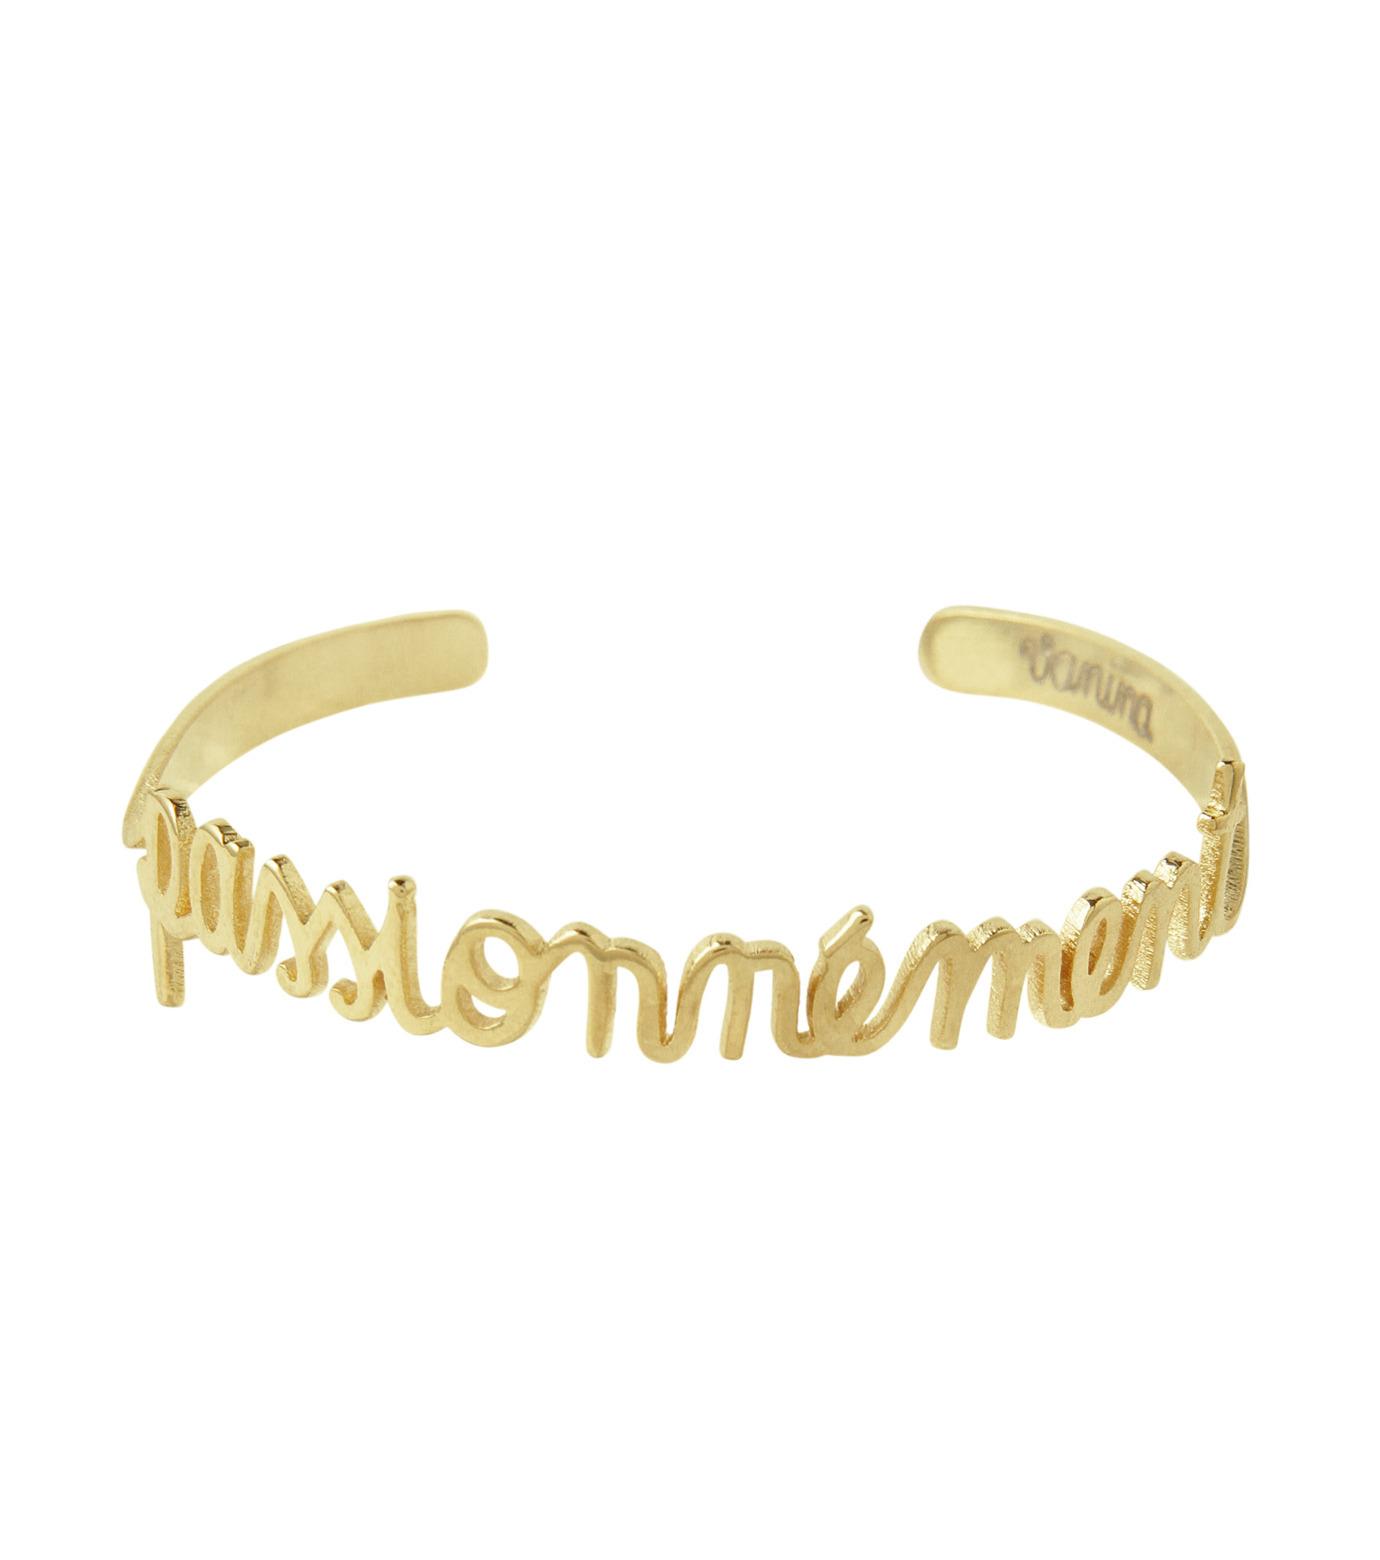 VANINA(バニーナ)のPassionnement Bracelet-GOLD(アクセサリー/accessory)-AMOUR-Pass-L 拡大詳細画像1